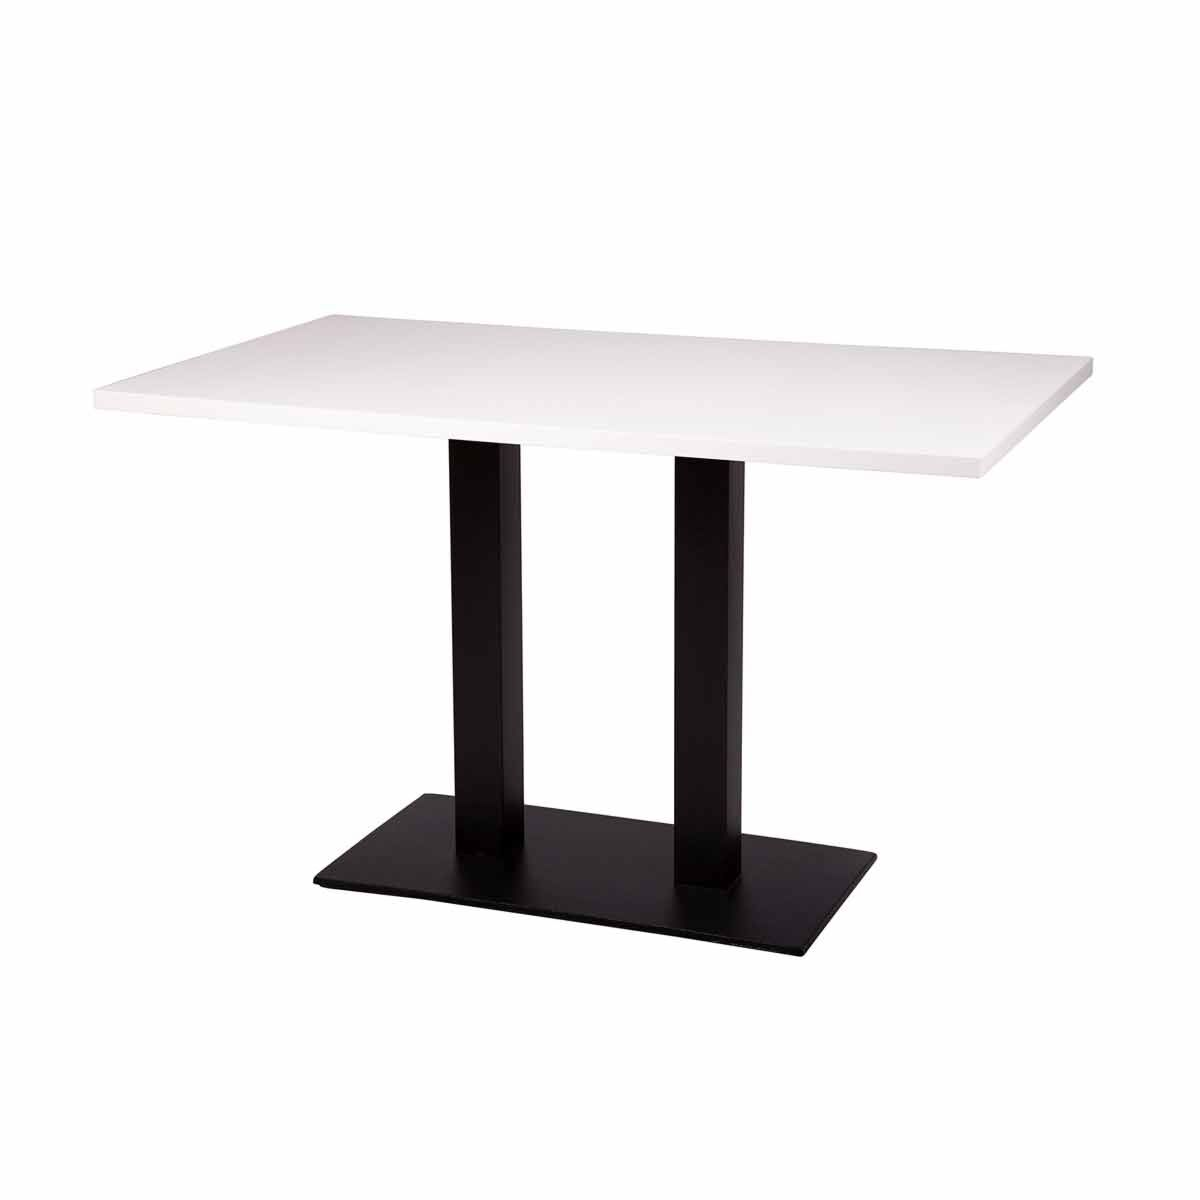 Tabilo Forza Twin Rectangular Dining Table 1200 x 700mm